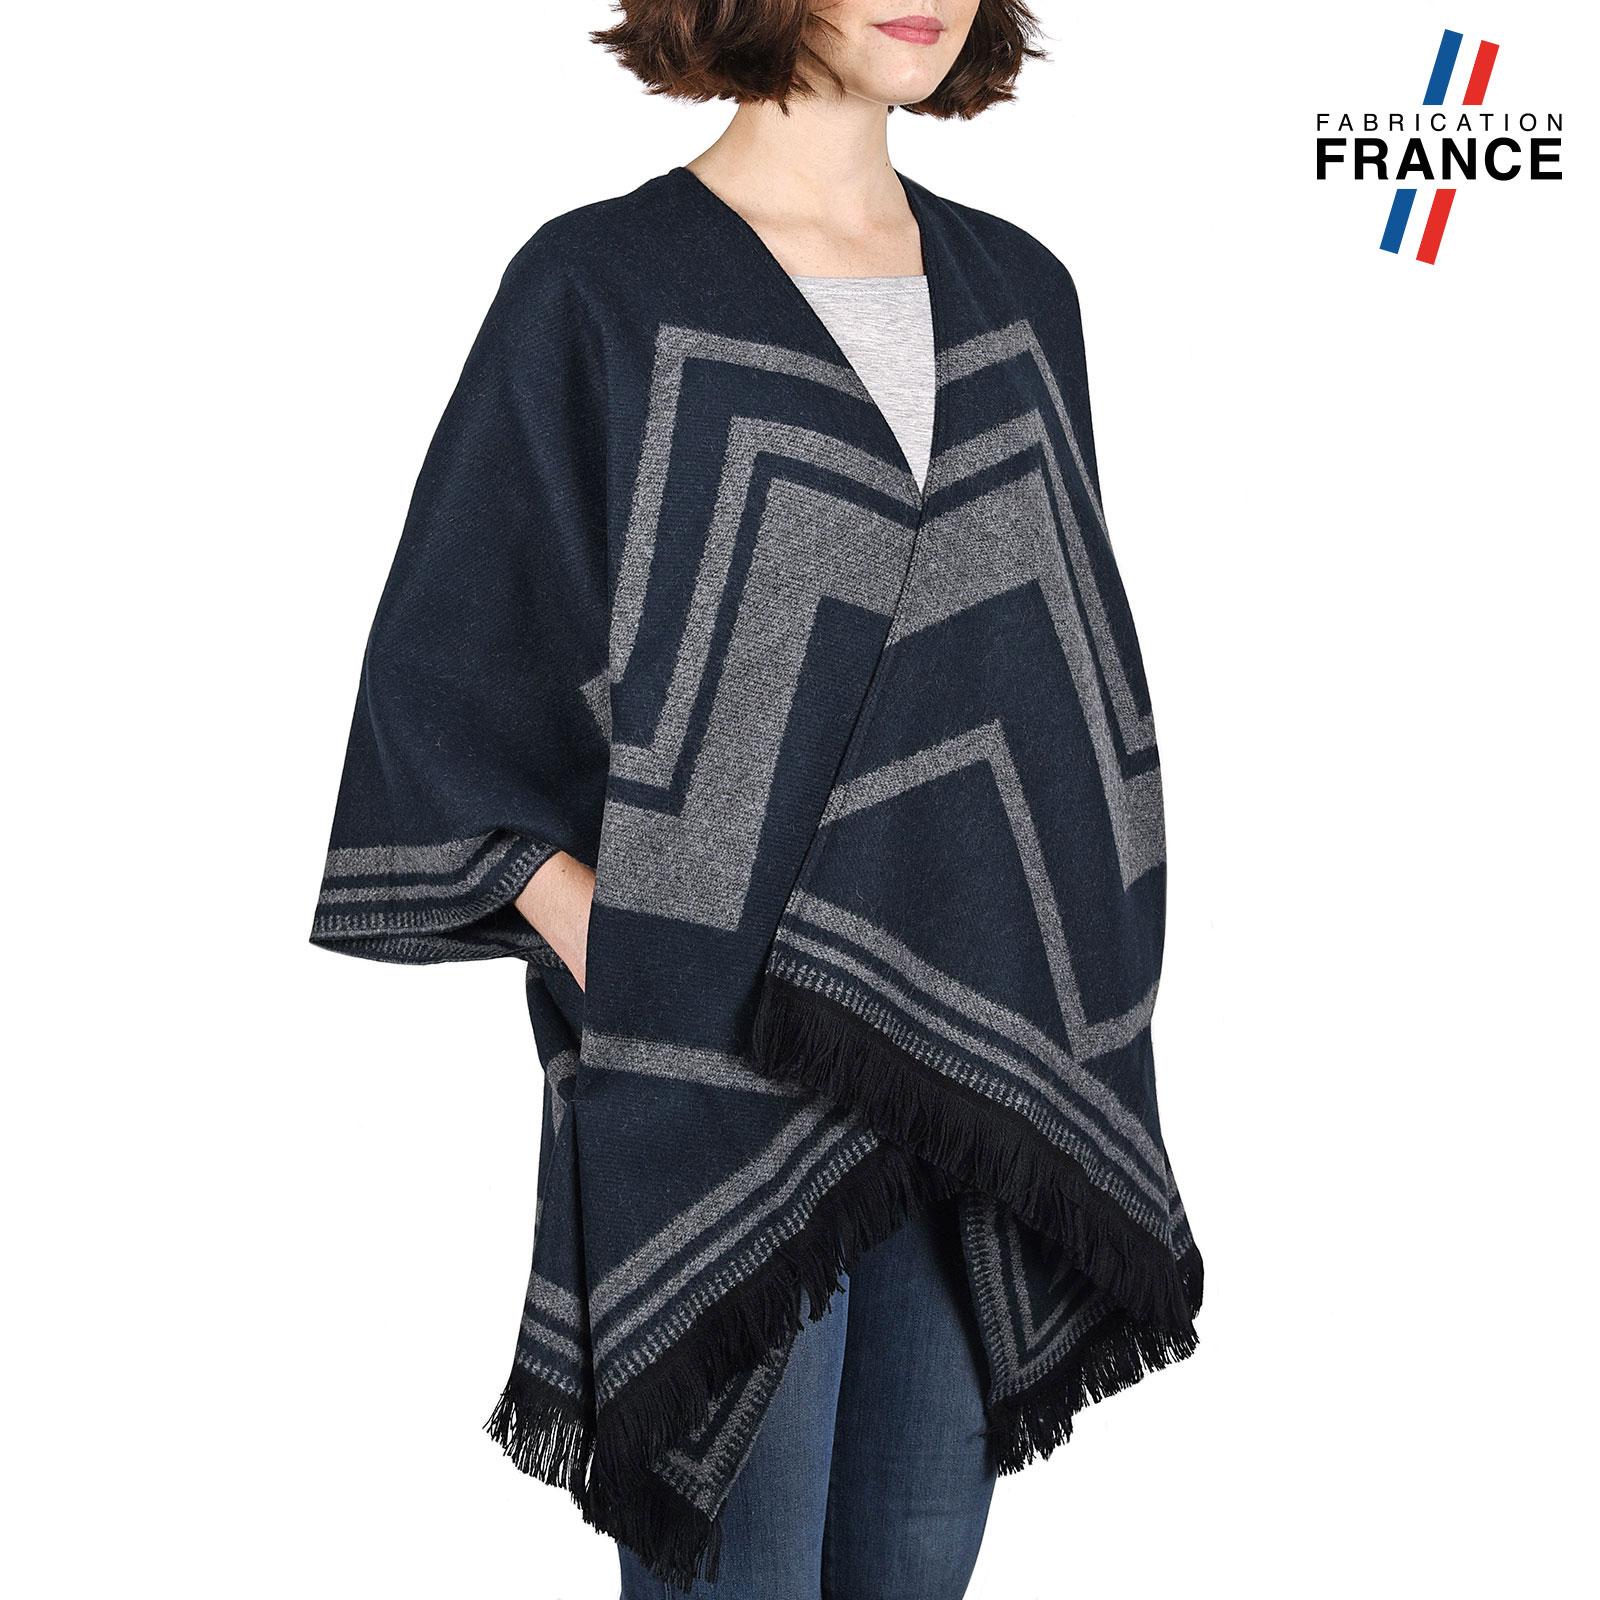 echarpe femme effet poncho foulard femme biface style couverture. Black Bedroom Furniture Sets. Home Design Ideas